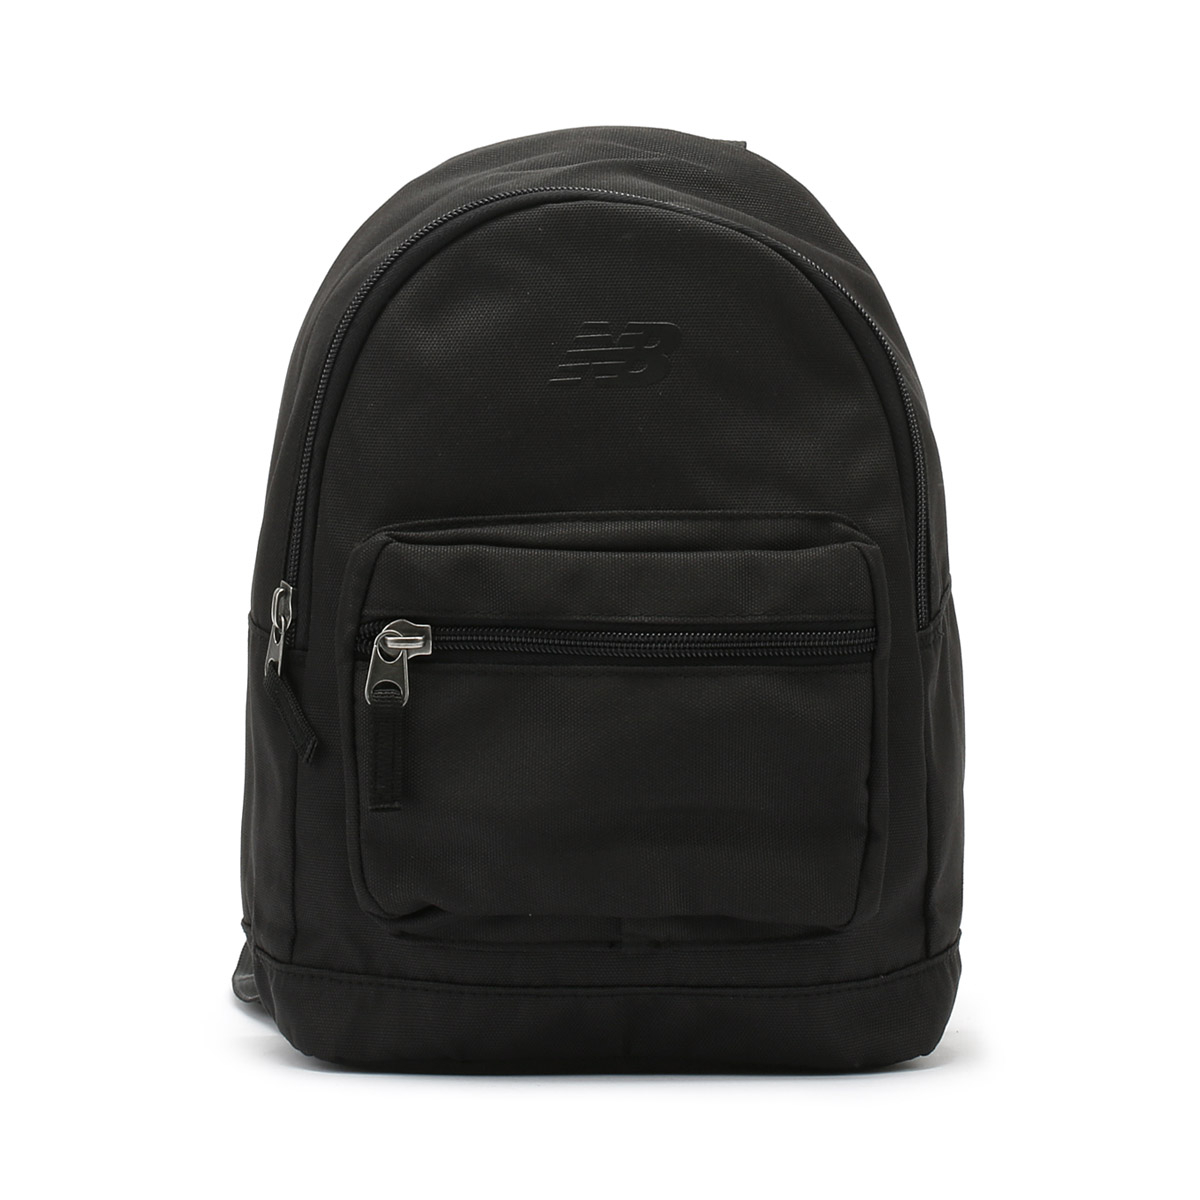 3295c265f62e Details about New Balance Black Mini Classic Backpack Unisex Travel School  Laptop Sleeve Bag